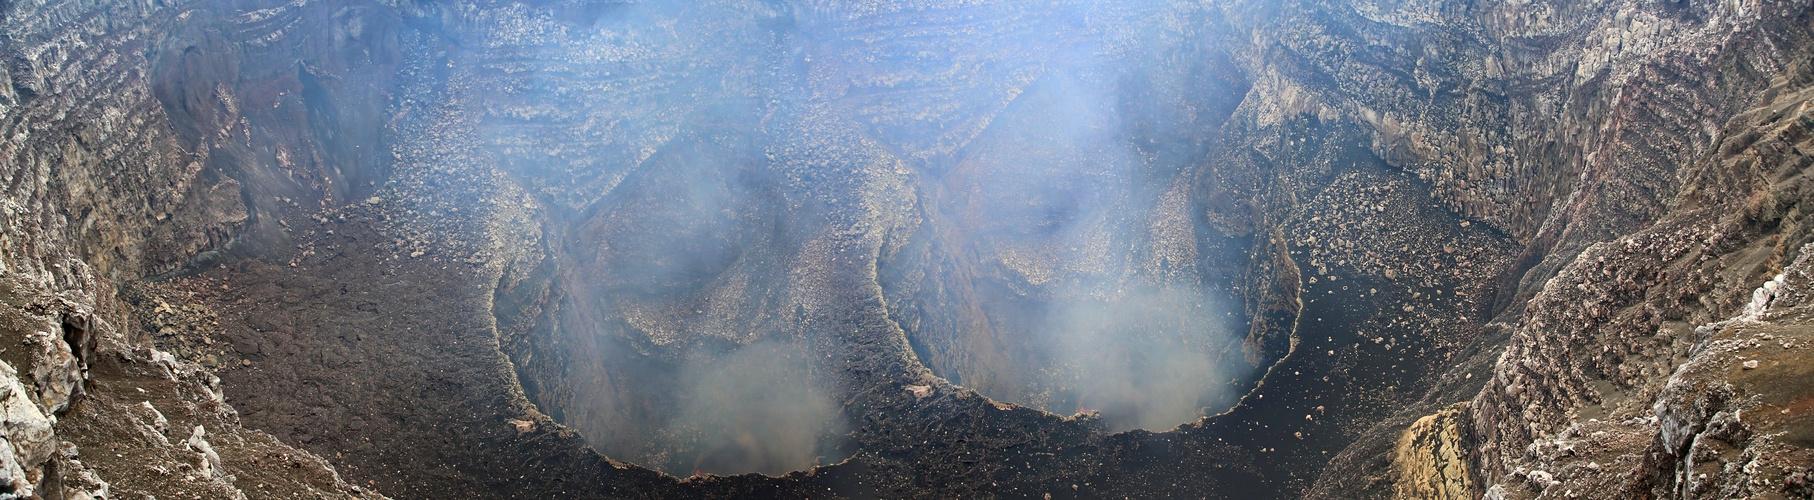 Nicaragua, Land der Vulkane